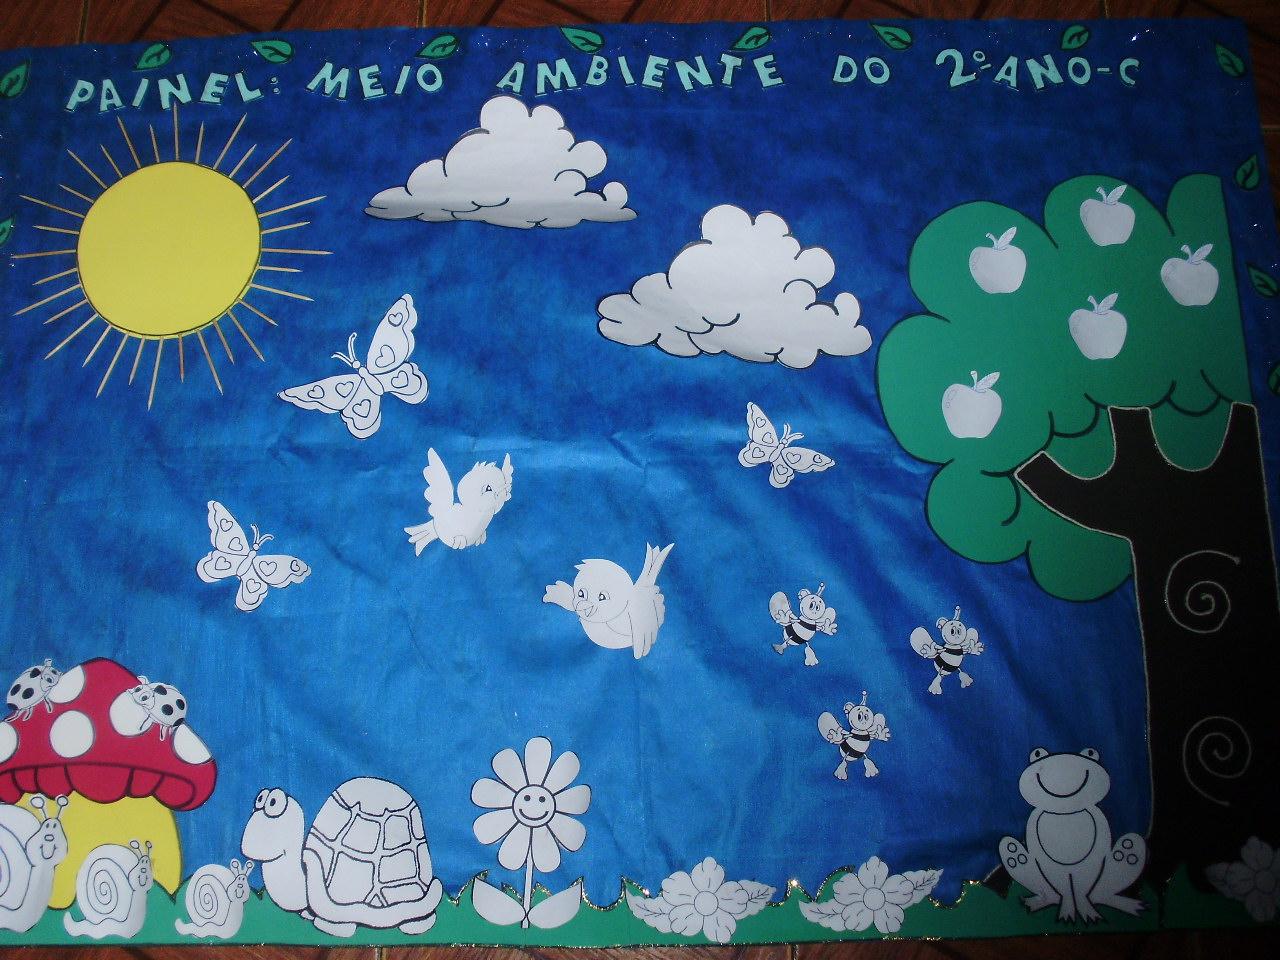 "Tia Gleici"": Painel meio ambiente"